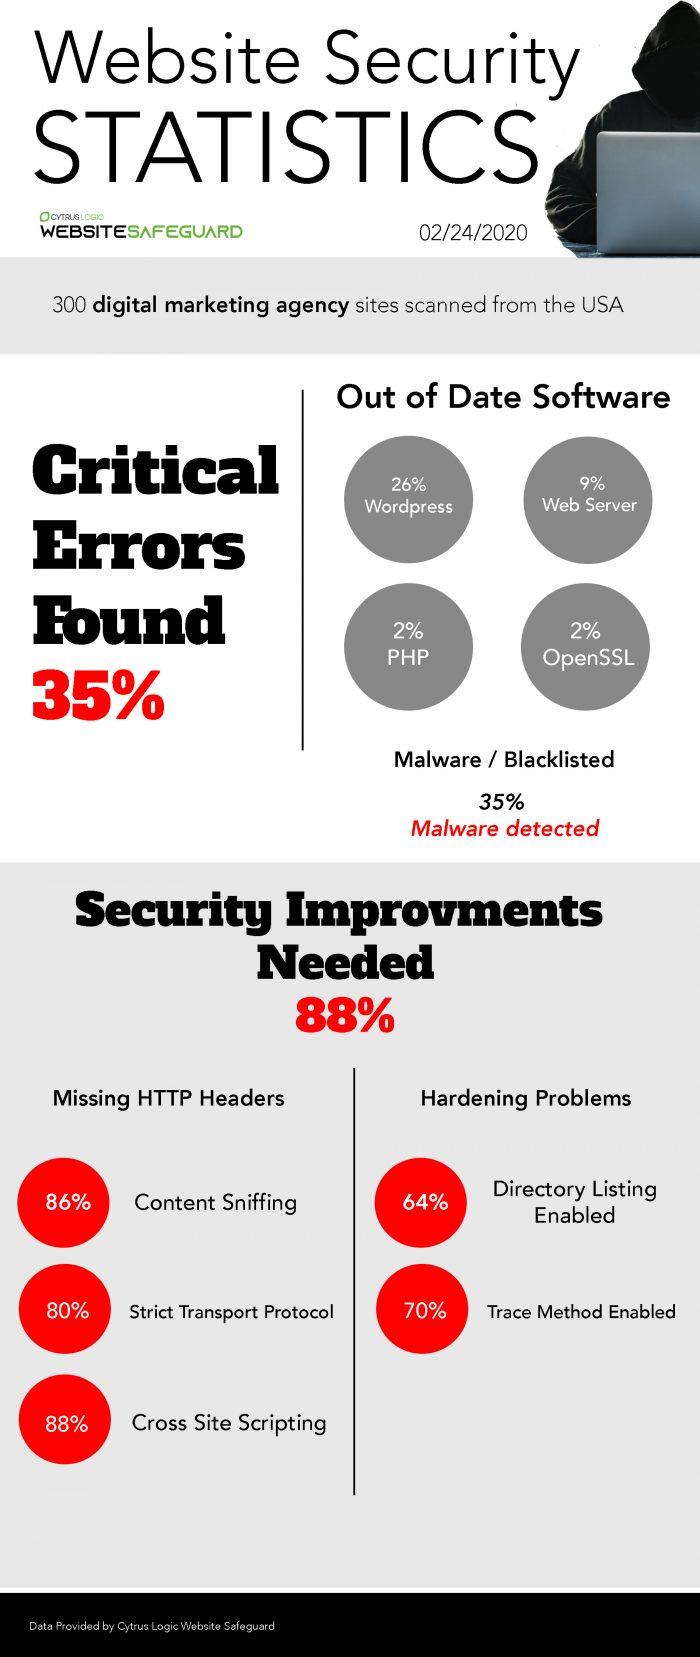 website Security Statistics by Cytrus Logic Website Safeguard